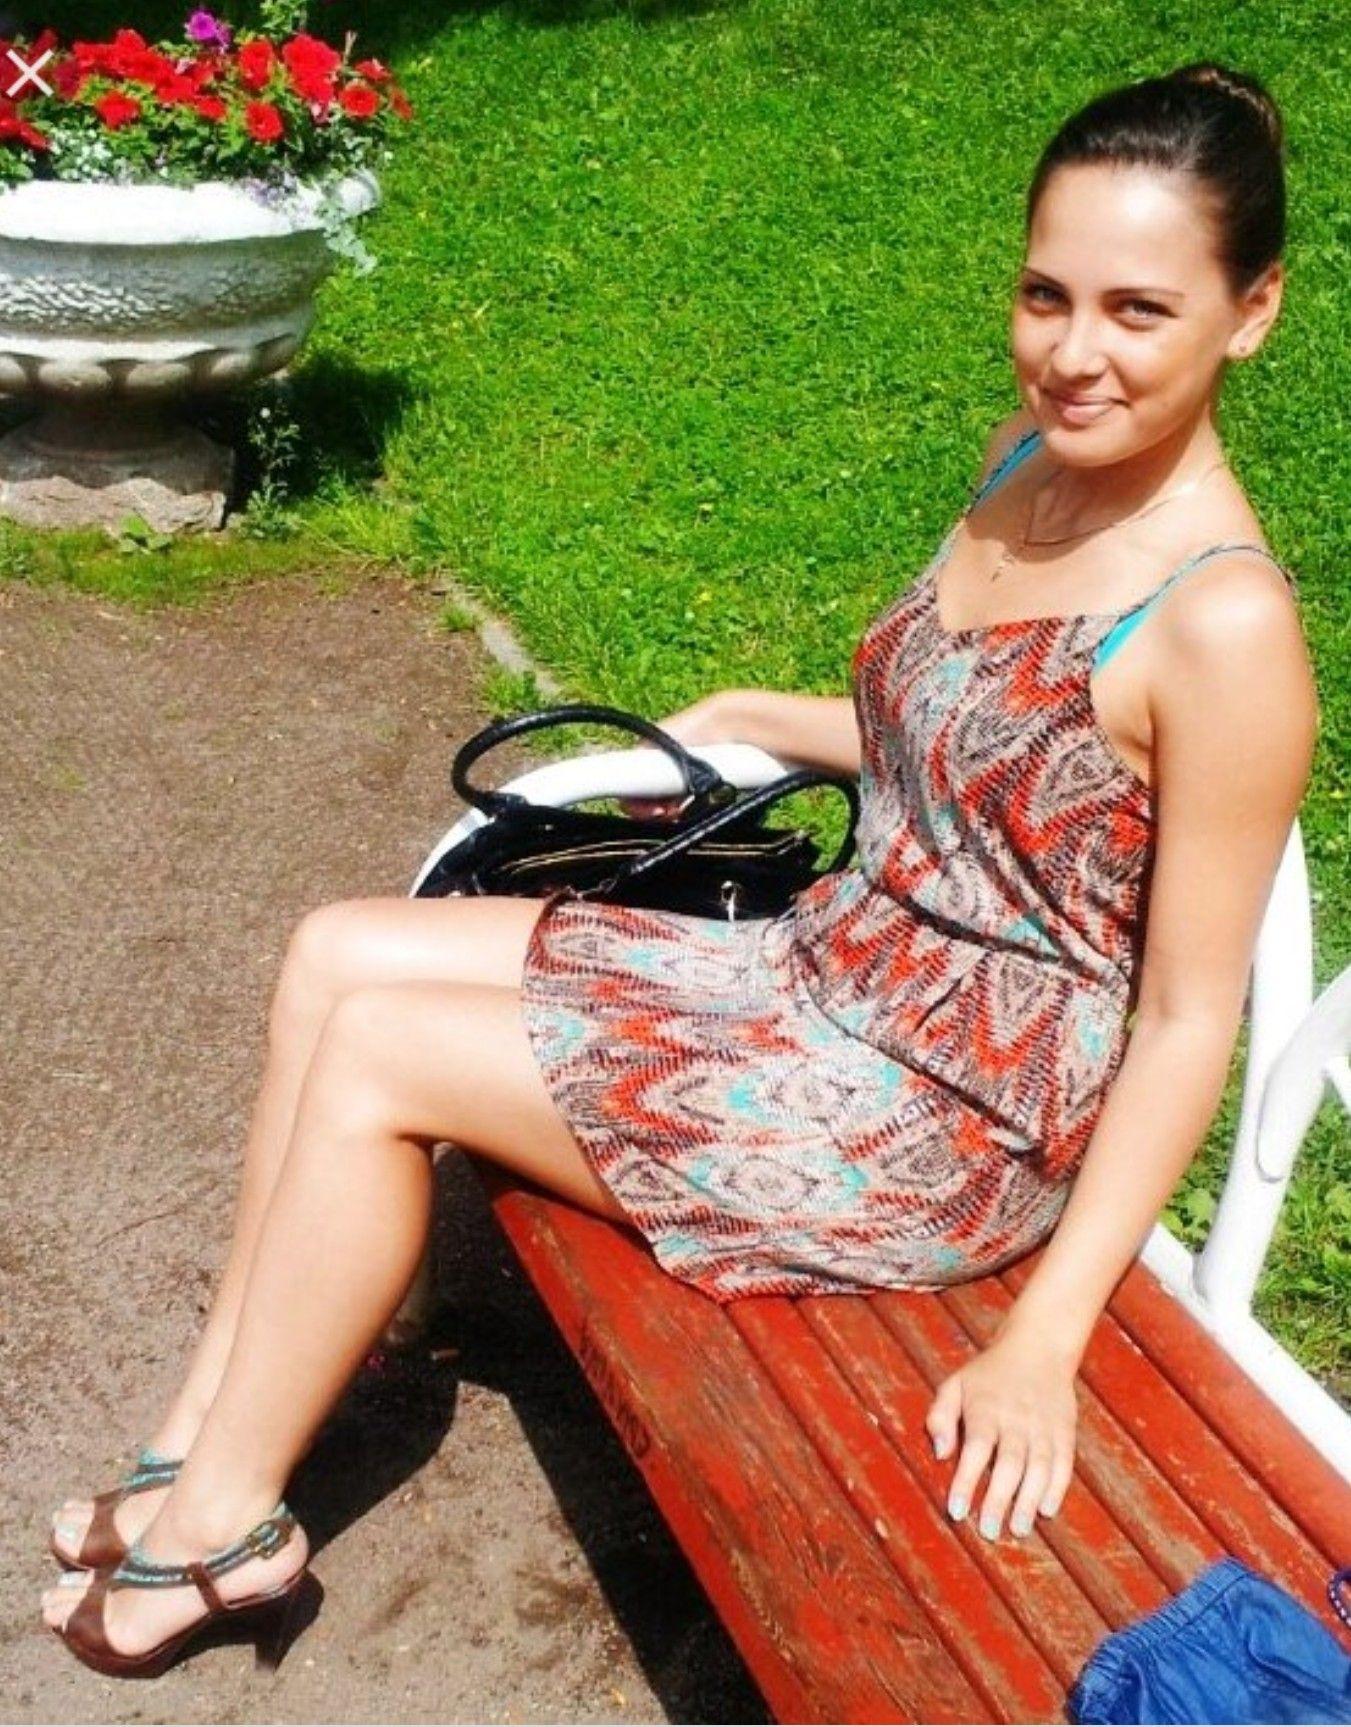 Anastasia Bryzgalova Nude Photos 49